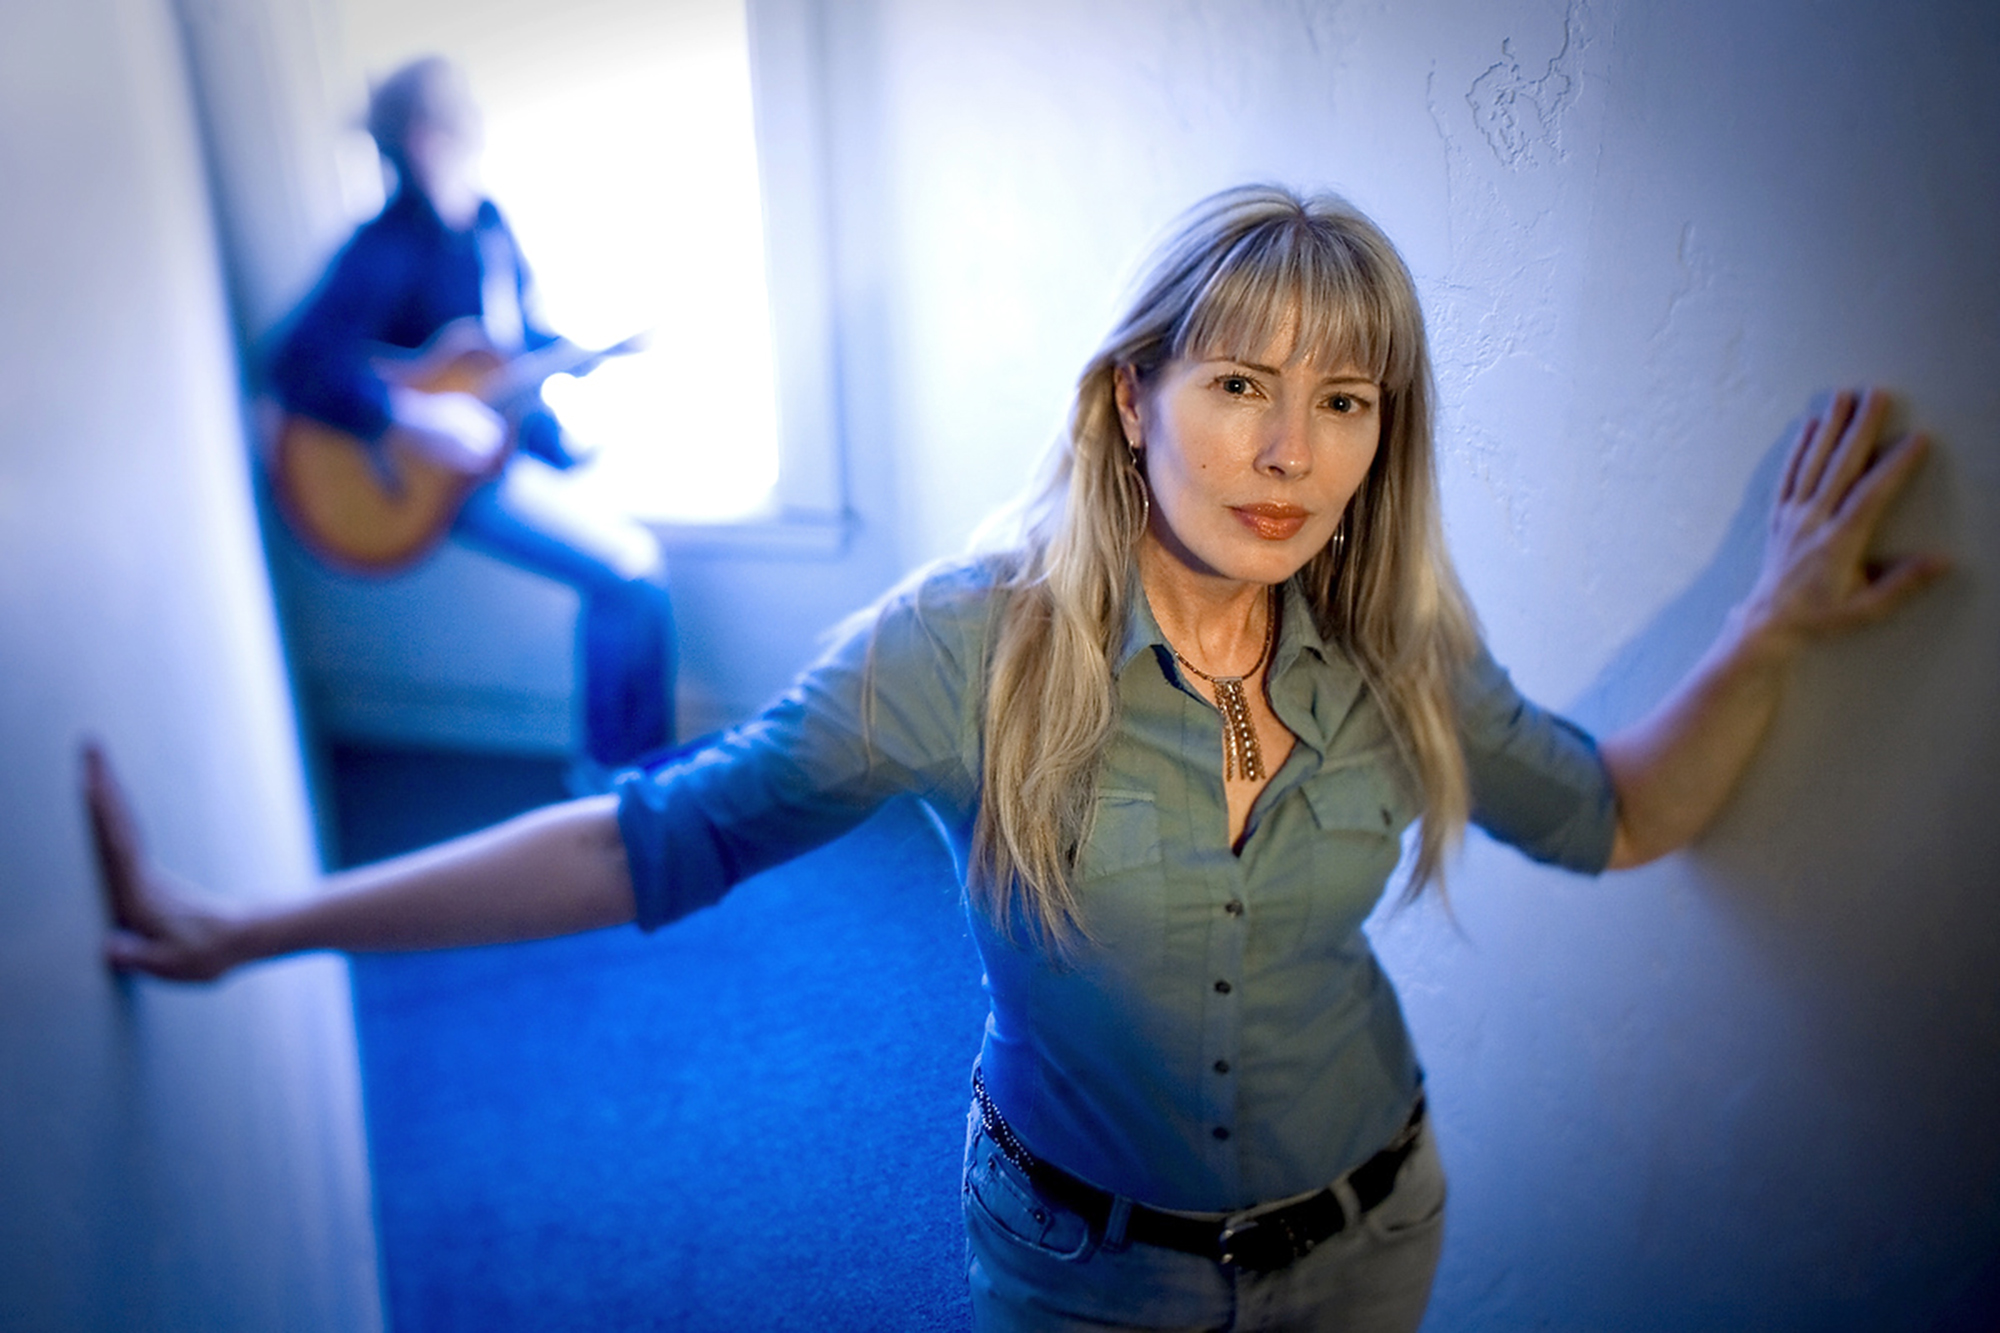 Sony Holland - recording artist